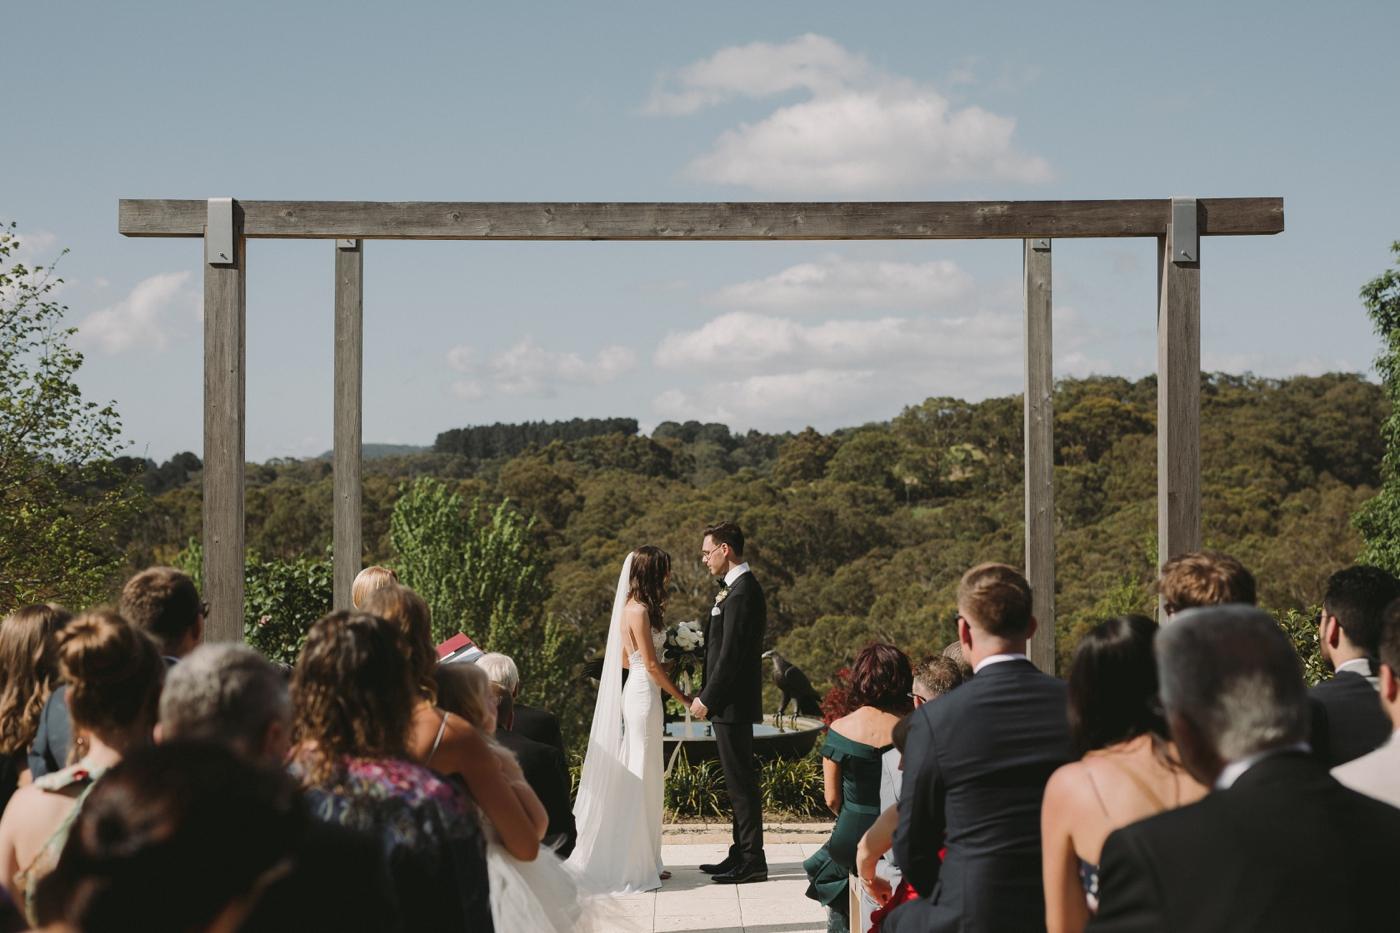 Katie and Ben - Natural Wedding Photography in Adelaide - Beautiful, Candid Wedding Photographer - Adelaide Hills Wedding - Katherine Schultz - www.katherineschultzphotography.com_0028.jpg